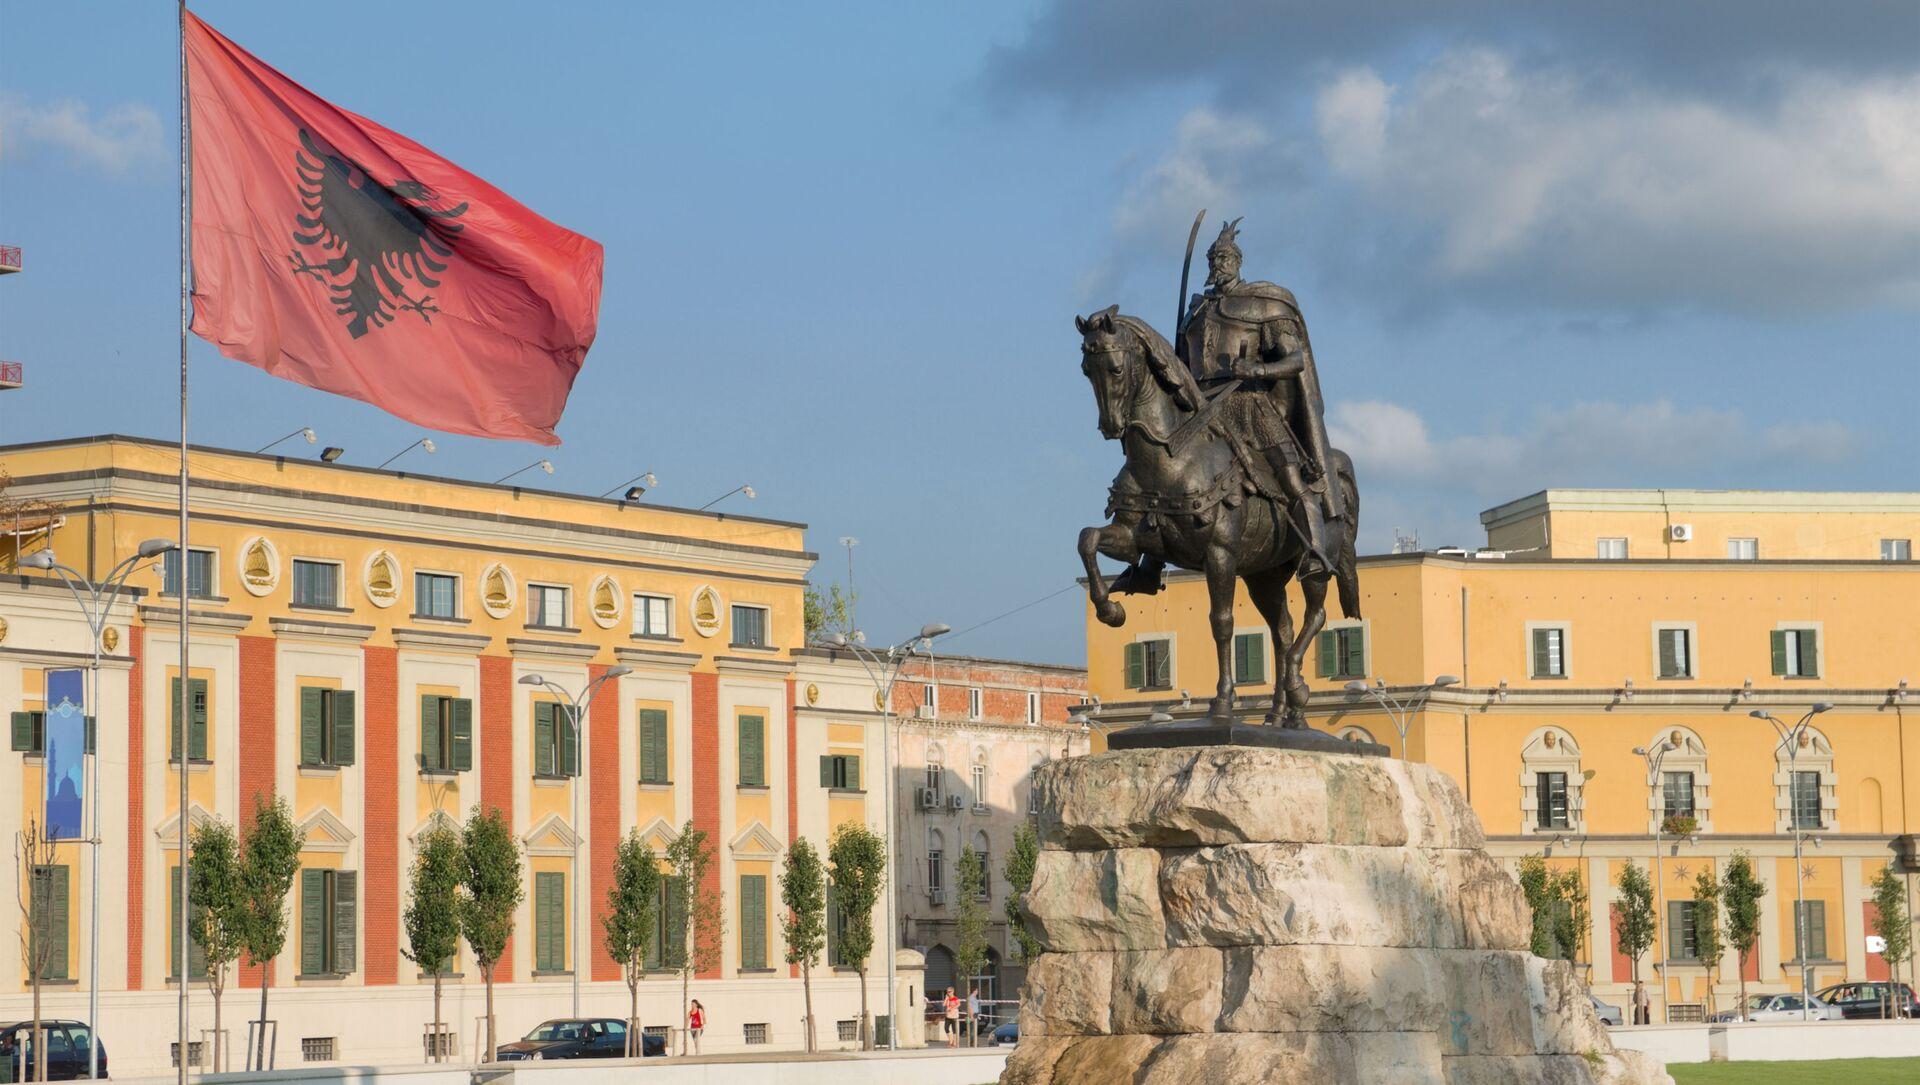 Plac Skanderbega w centrum Tirany, stolicy Albanii - Sputnik Polska, 1920, 25.04.2021